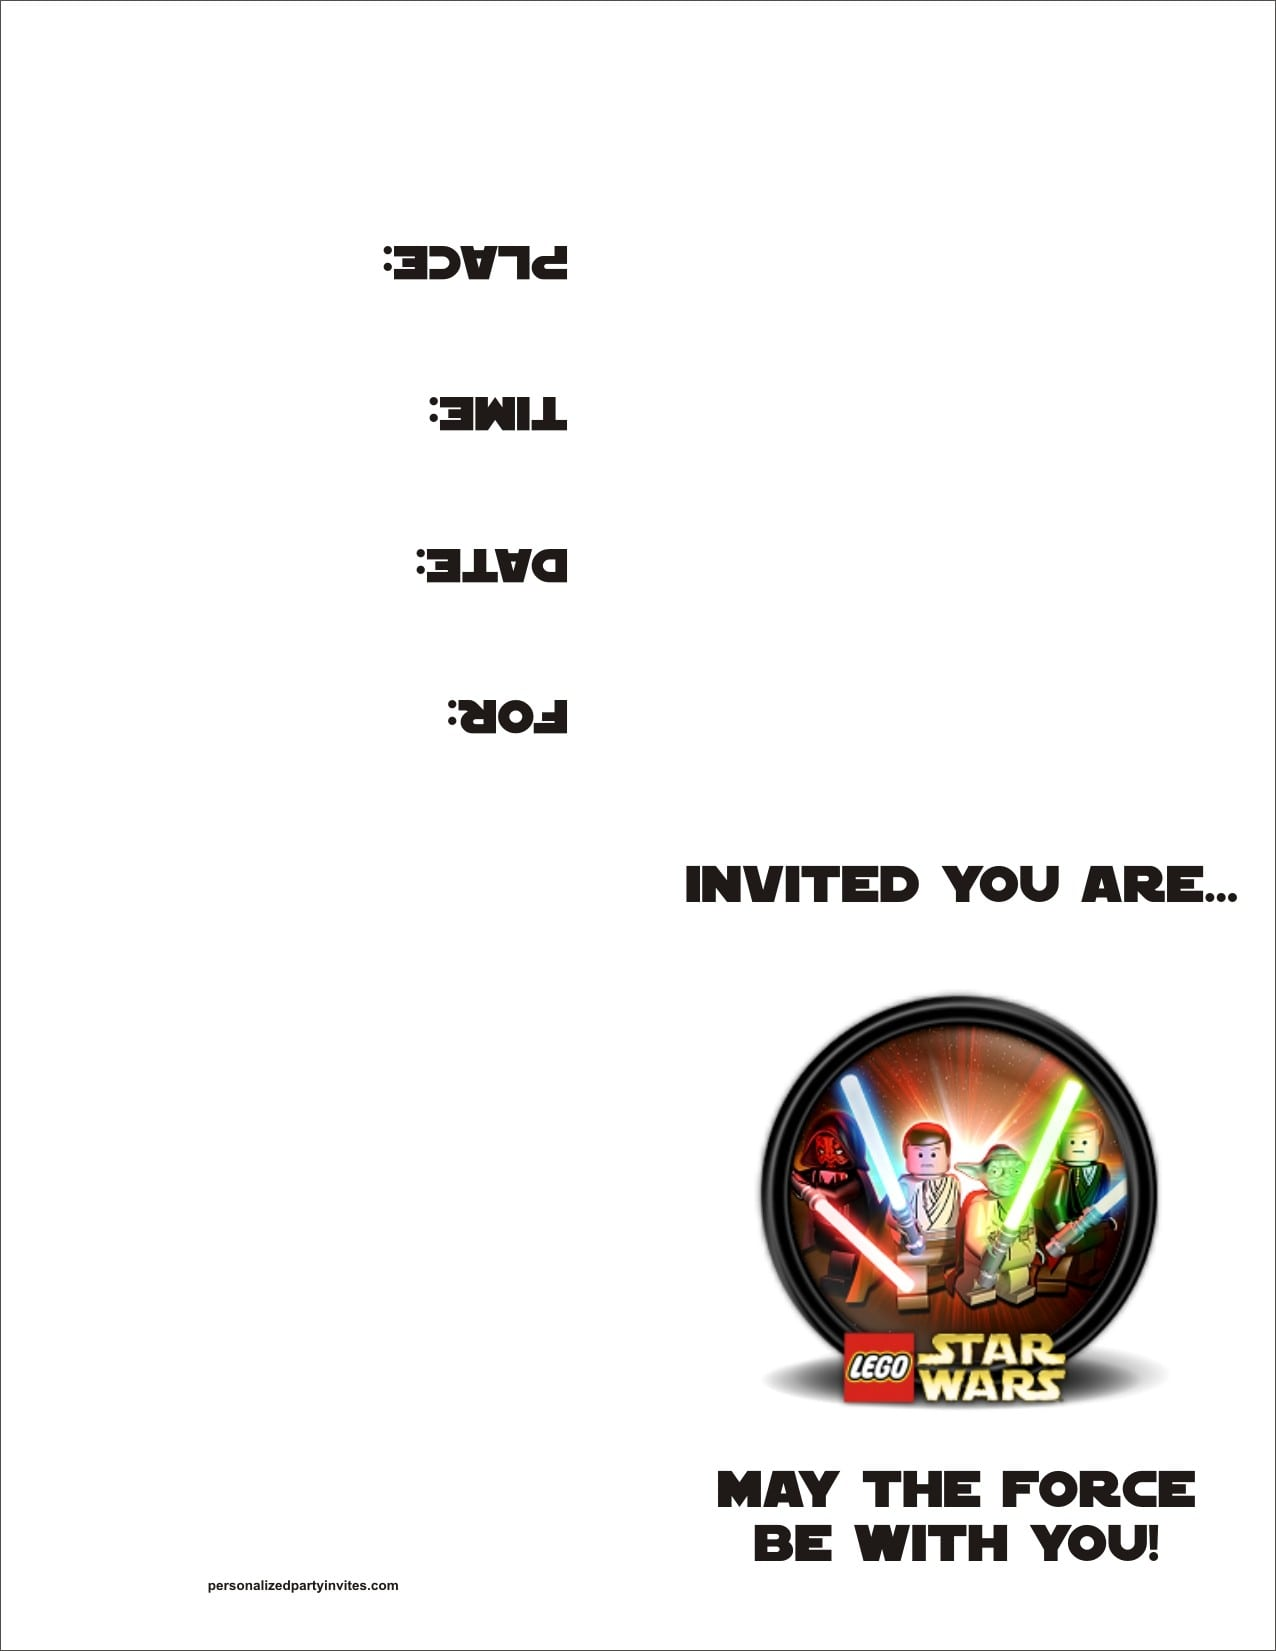 Star Wars Birthday Party Invitation Template Free